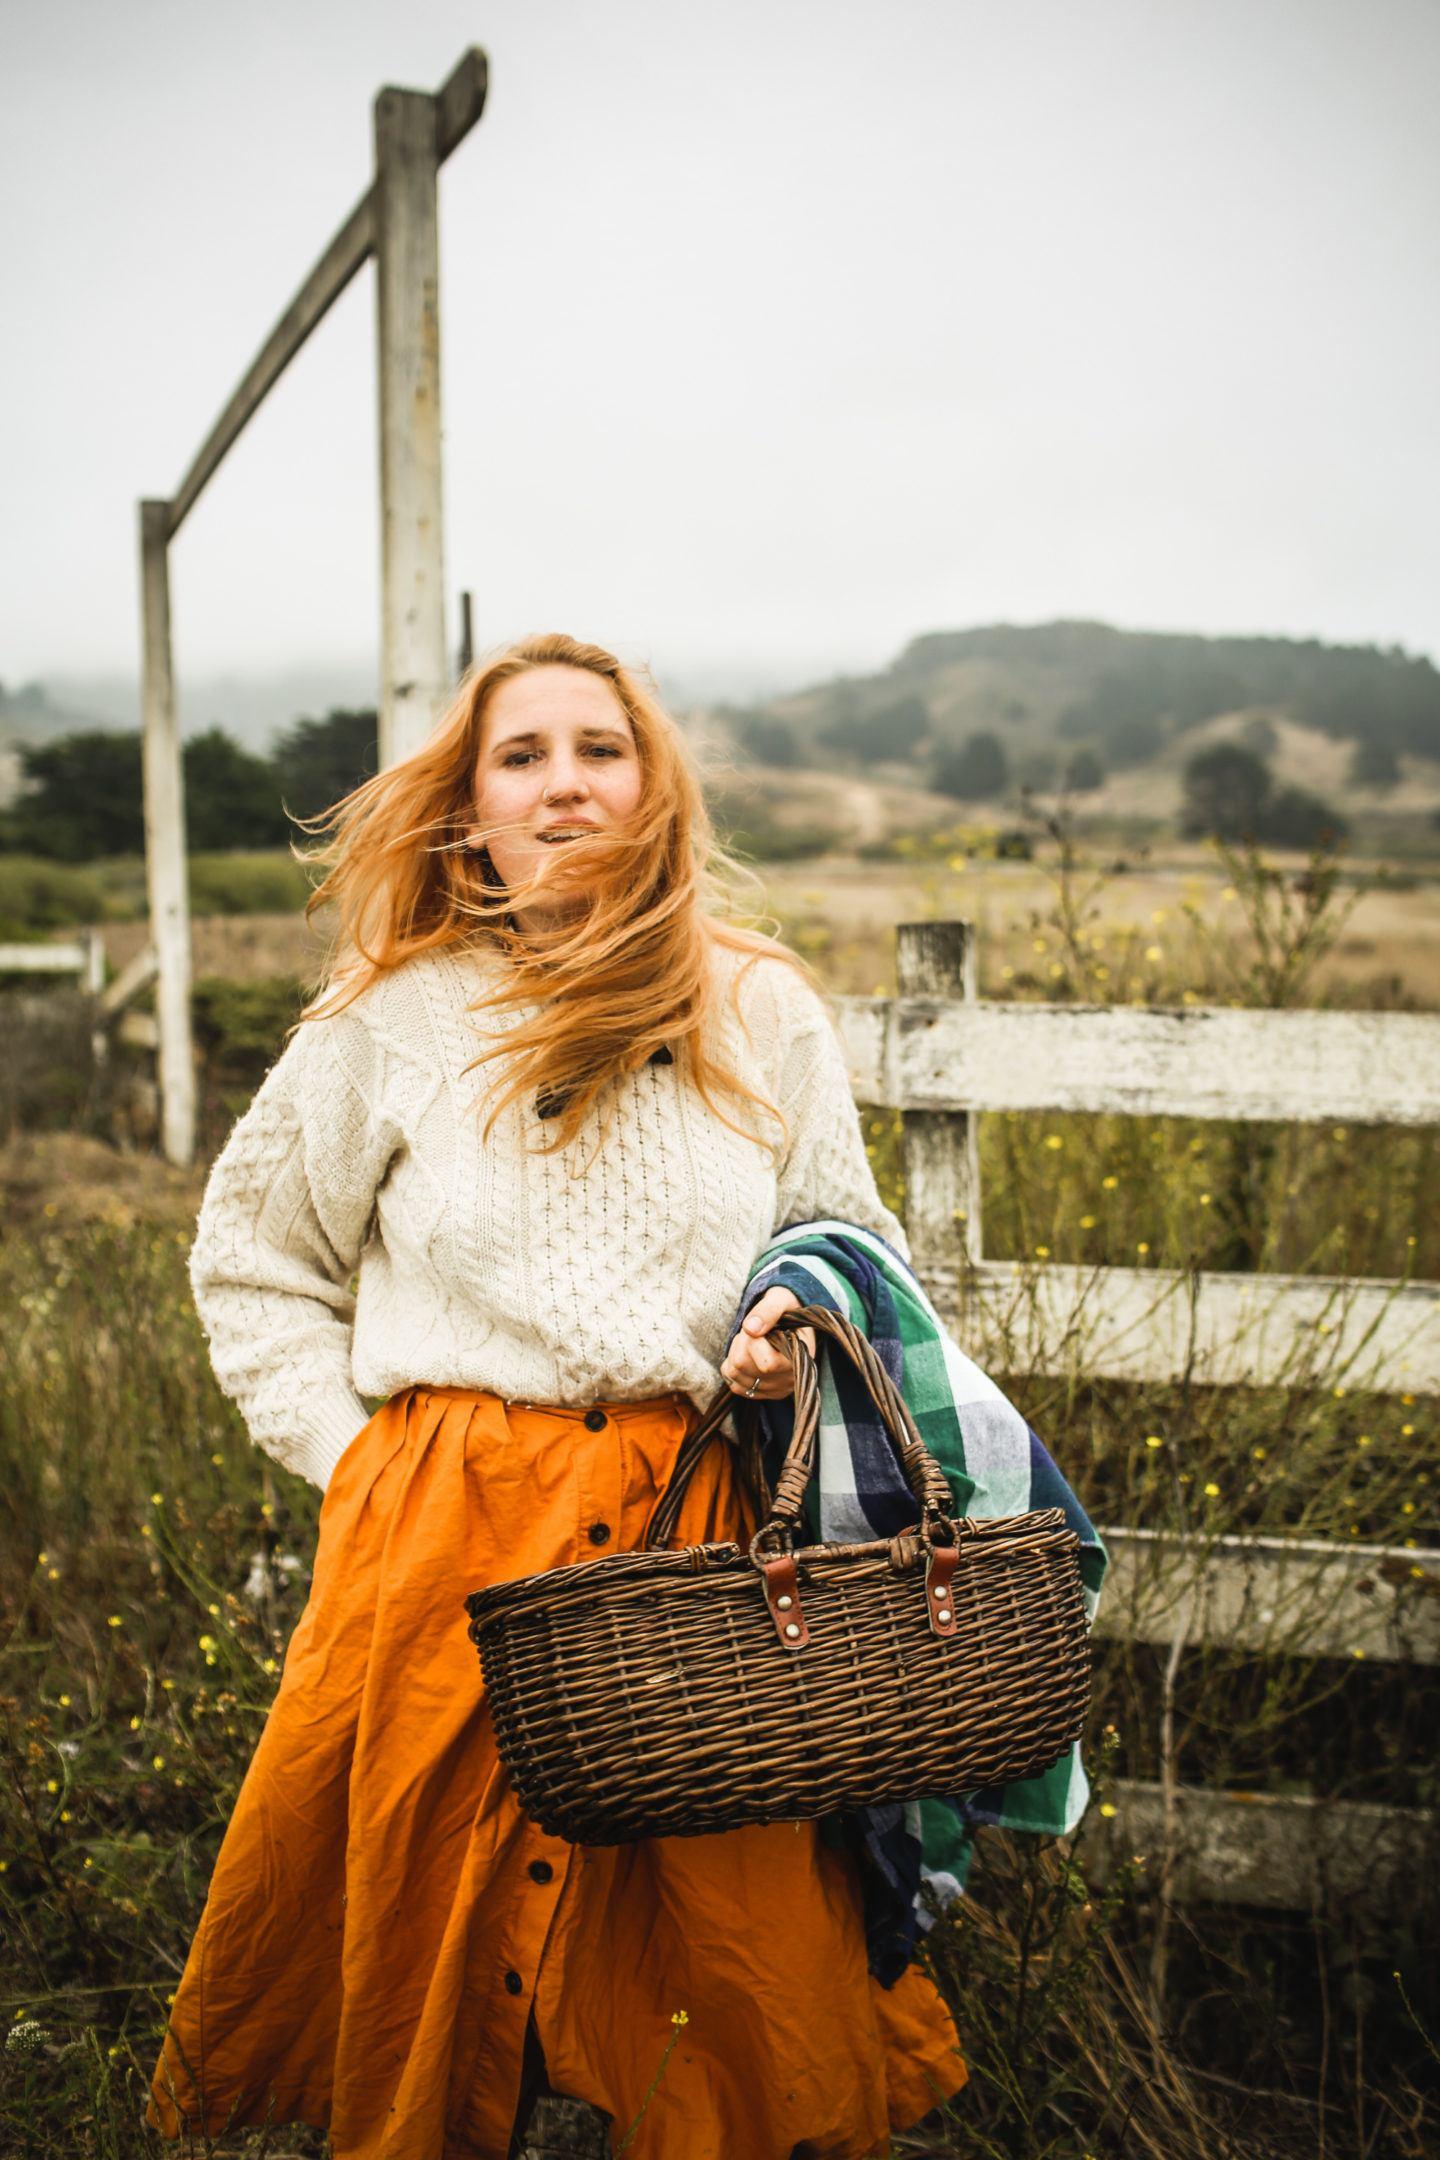 Woman holding a picnic basket